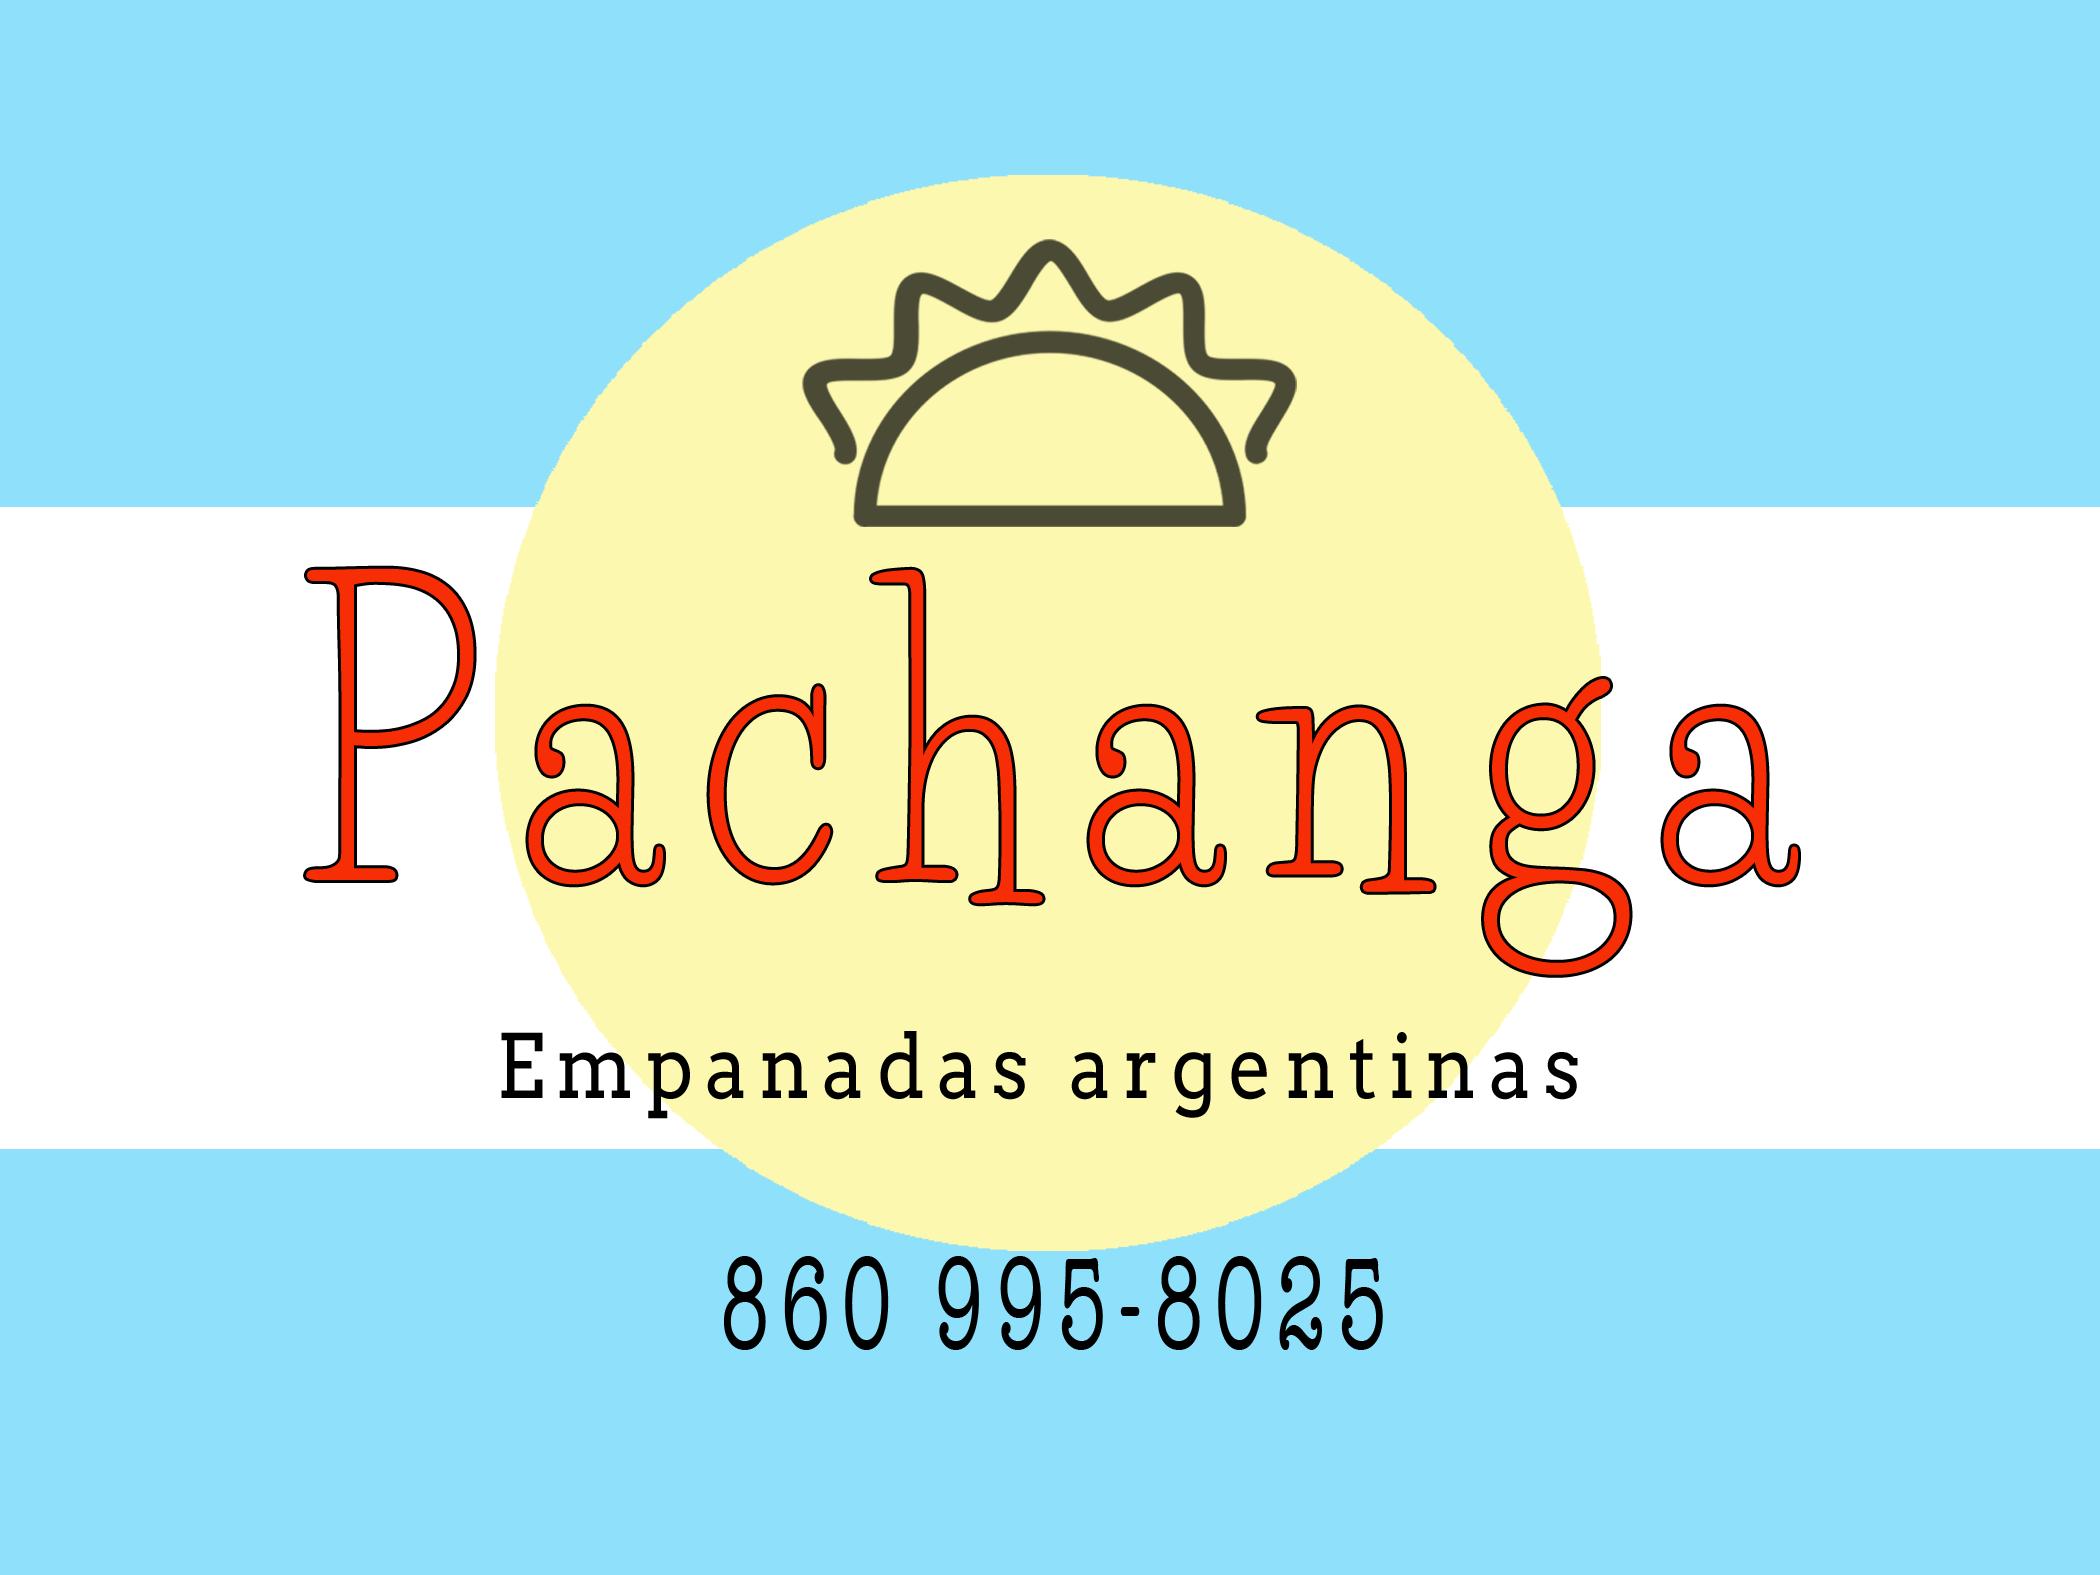 Pachanga Empanadas Argentinas